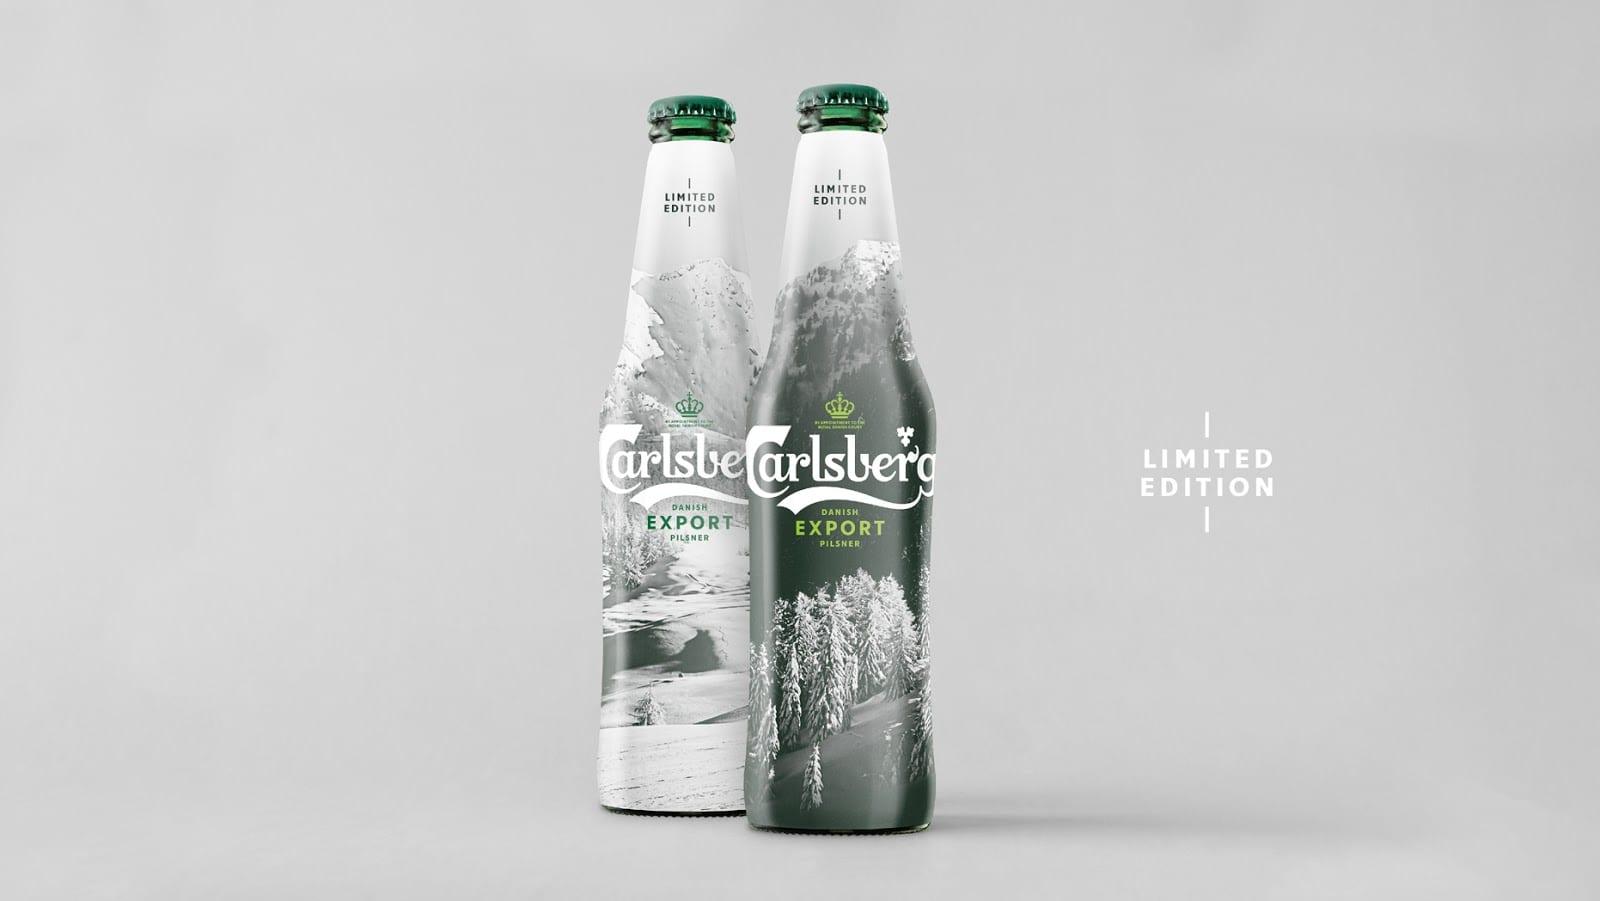 CB Afterski Actual Fade Case 03 - Limitovaná edice Carlsberg Export Pilsner